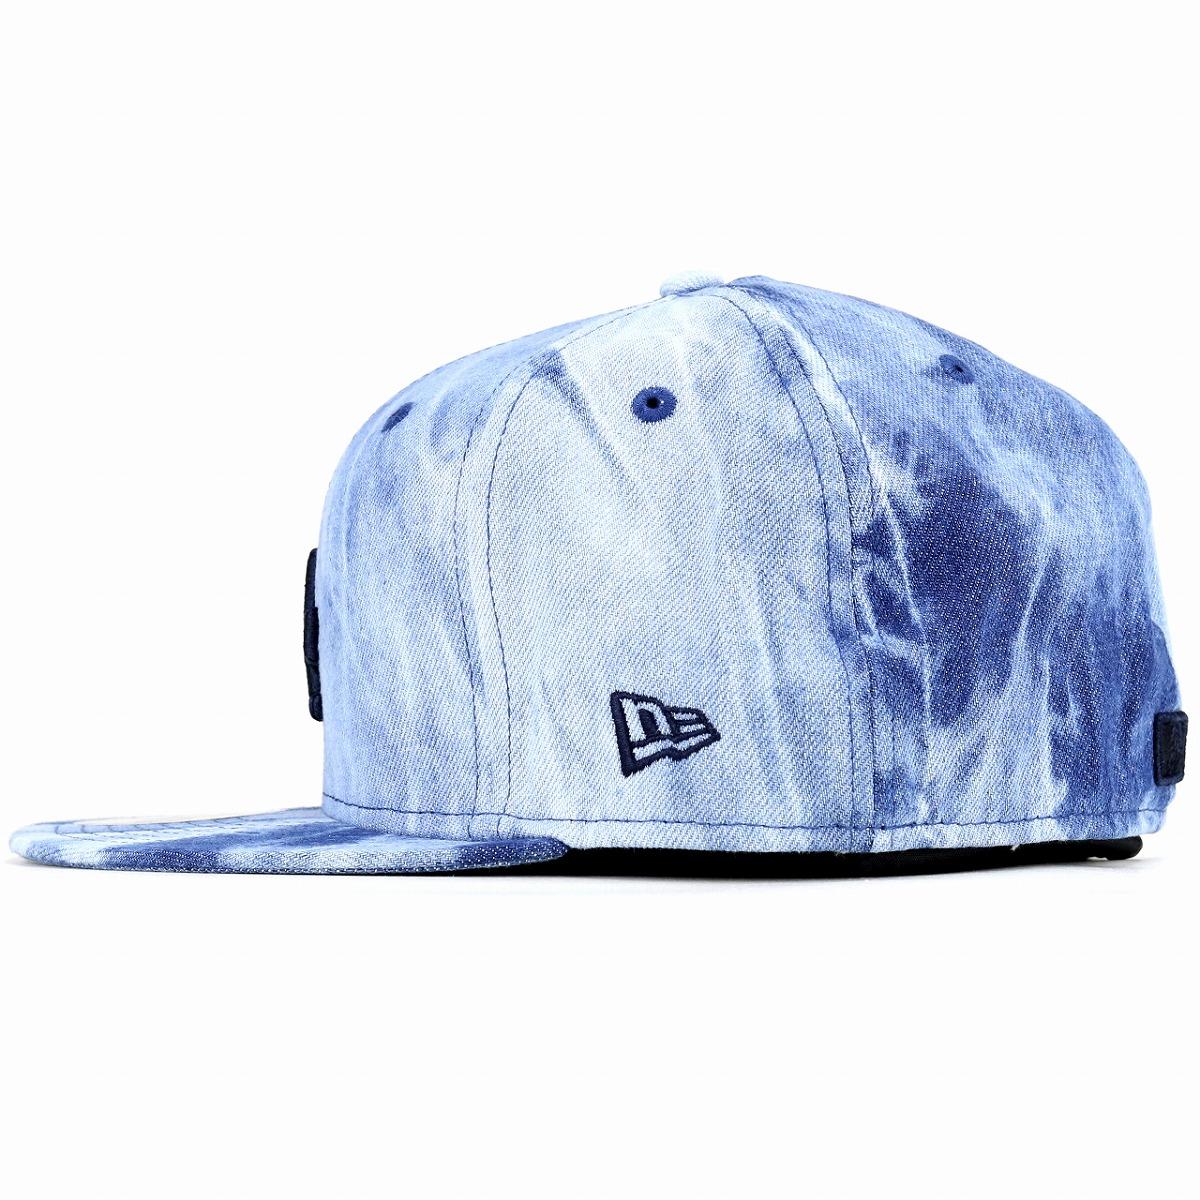 ... NEWERA cap bleach denim new gills Los Angeles Dodgers men gap Dis Tie  Dye Denim 59FIFTY ... 49302558821c